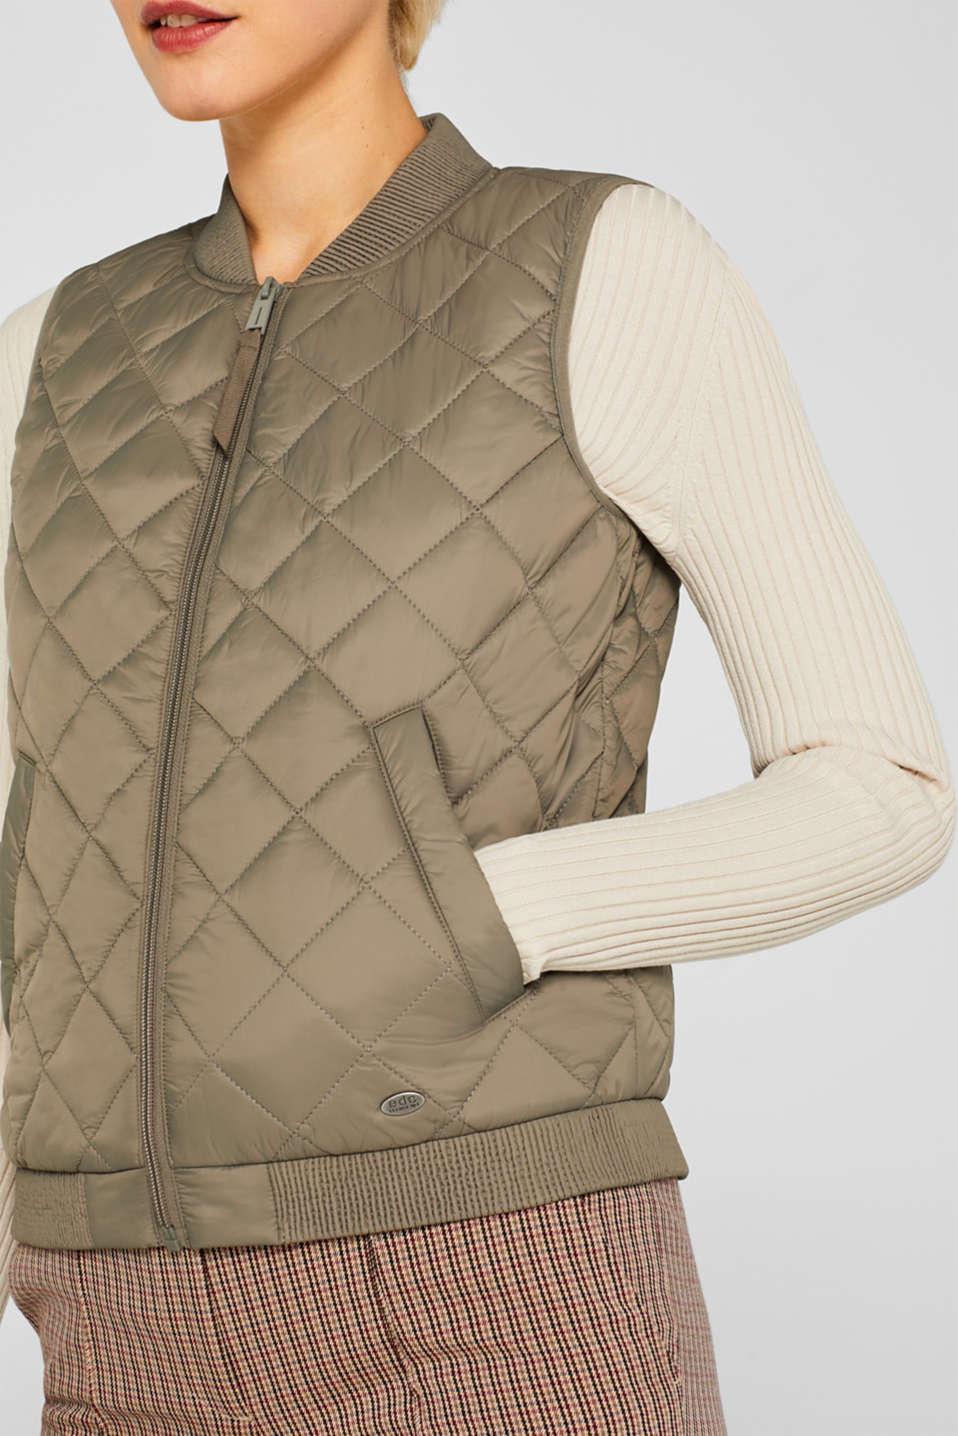 Vests outdoor woven, LIGHT KHAKI, detail image number 2